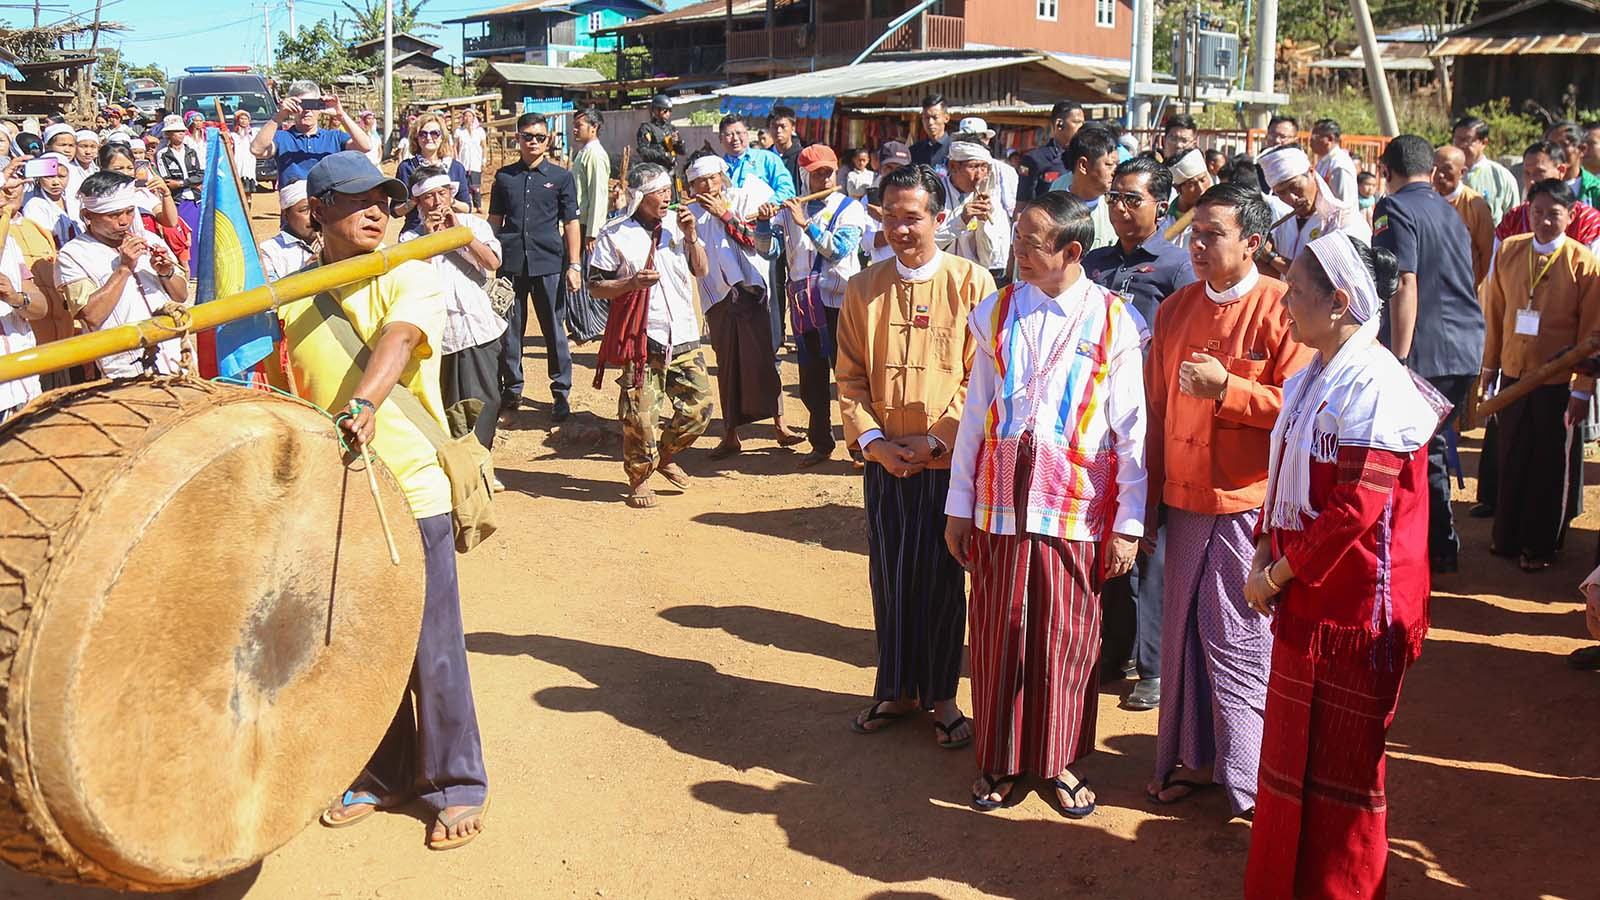 President U Win Myint looks around the celebration of 67th Anniversary of Kayah State Day in Kandahaywun Park in Loikaw yesterday.Photo: Ko Tha Byaw